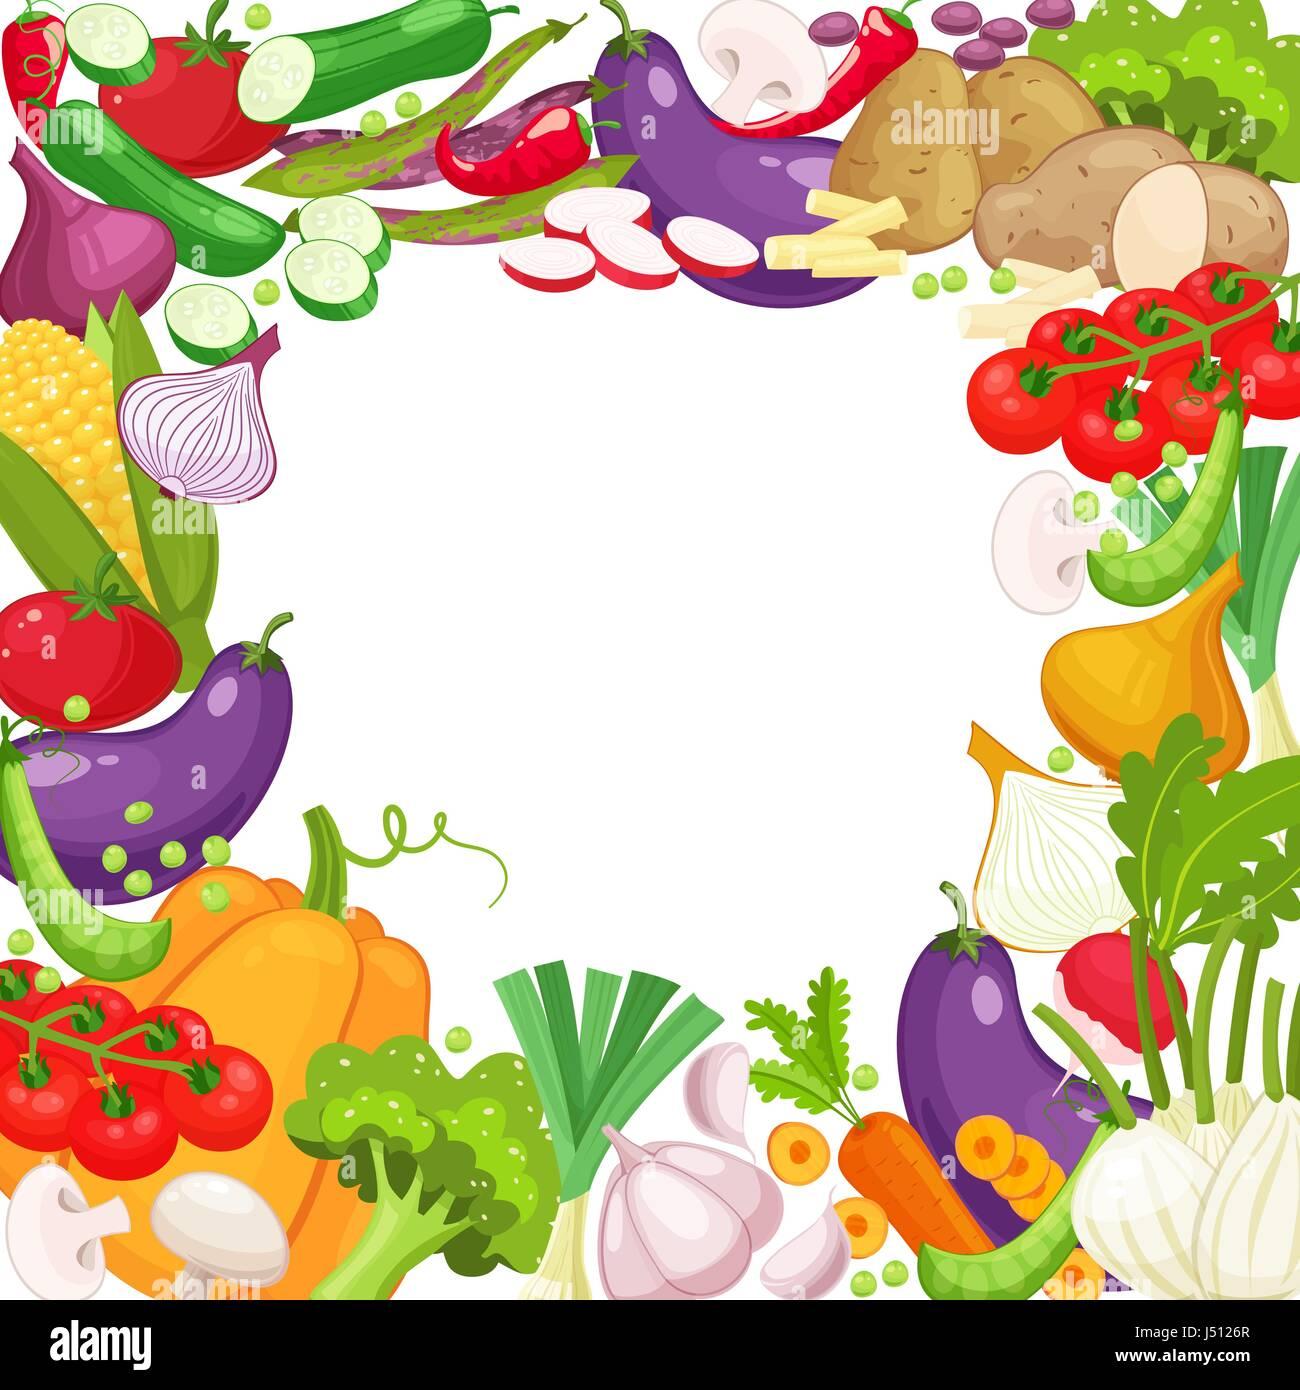 Vector frame of fresh vegetables for your design - Stock Vector